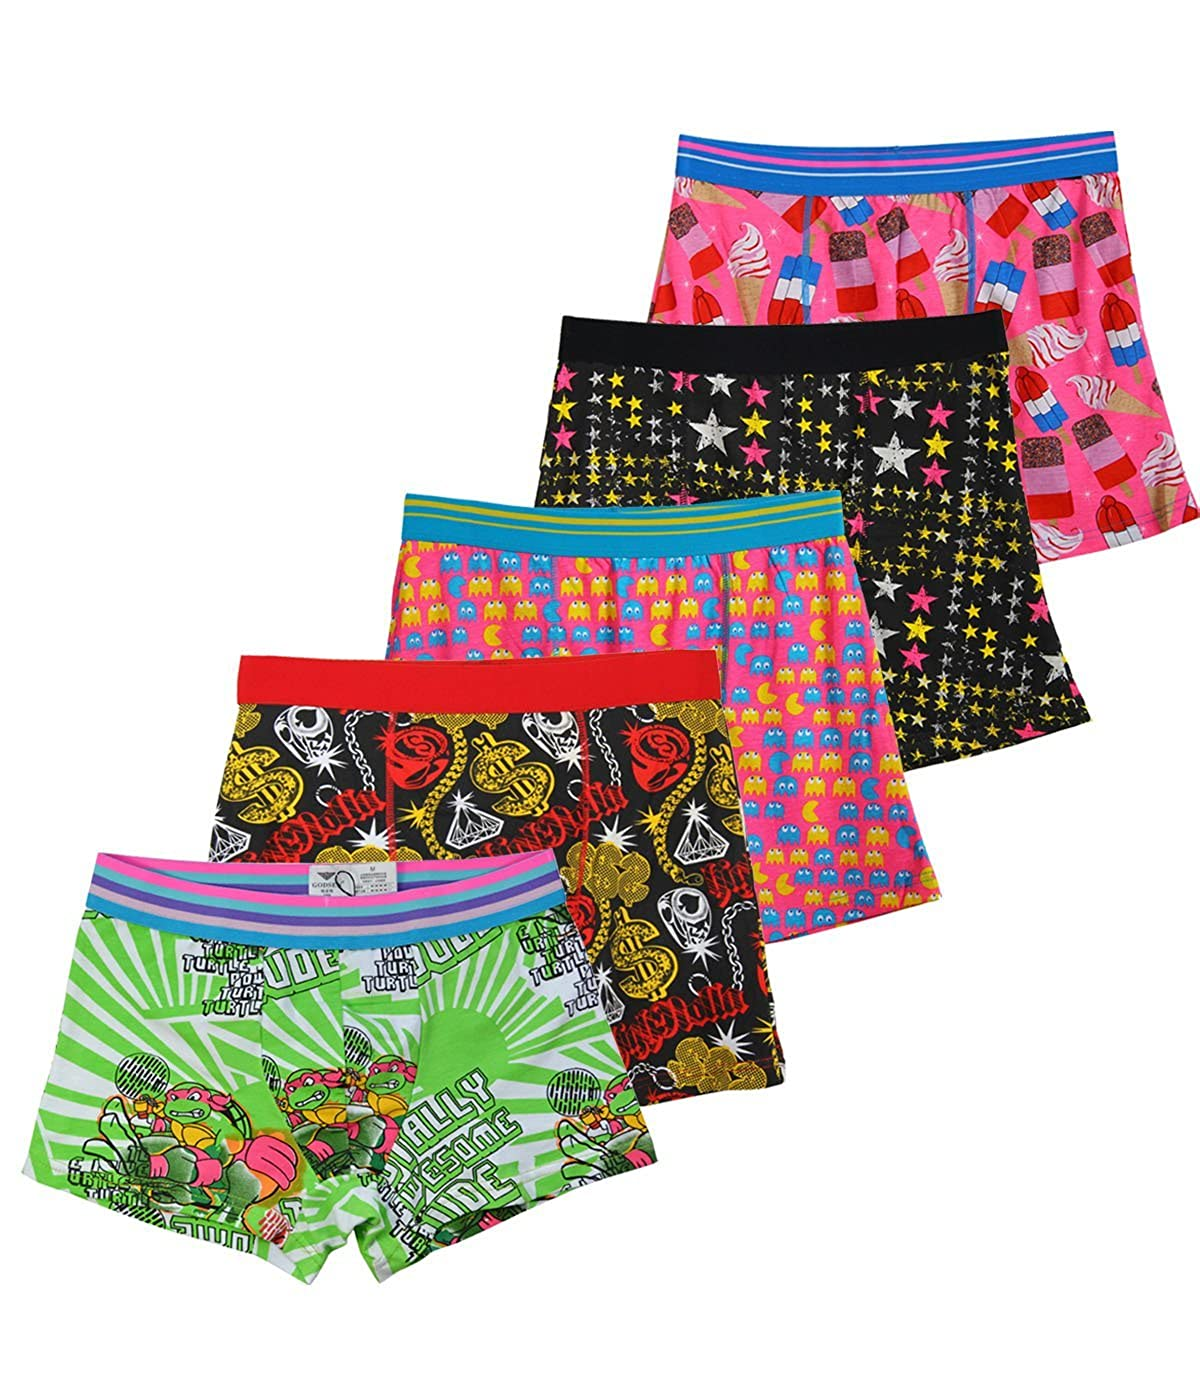 Godsen Mens Classic 5 Pack Boxer Briefs Cartoon Underwear